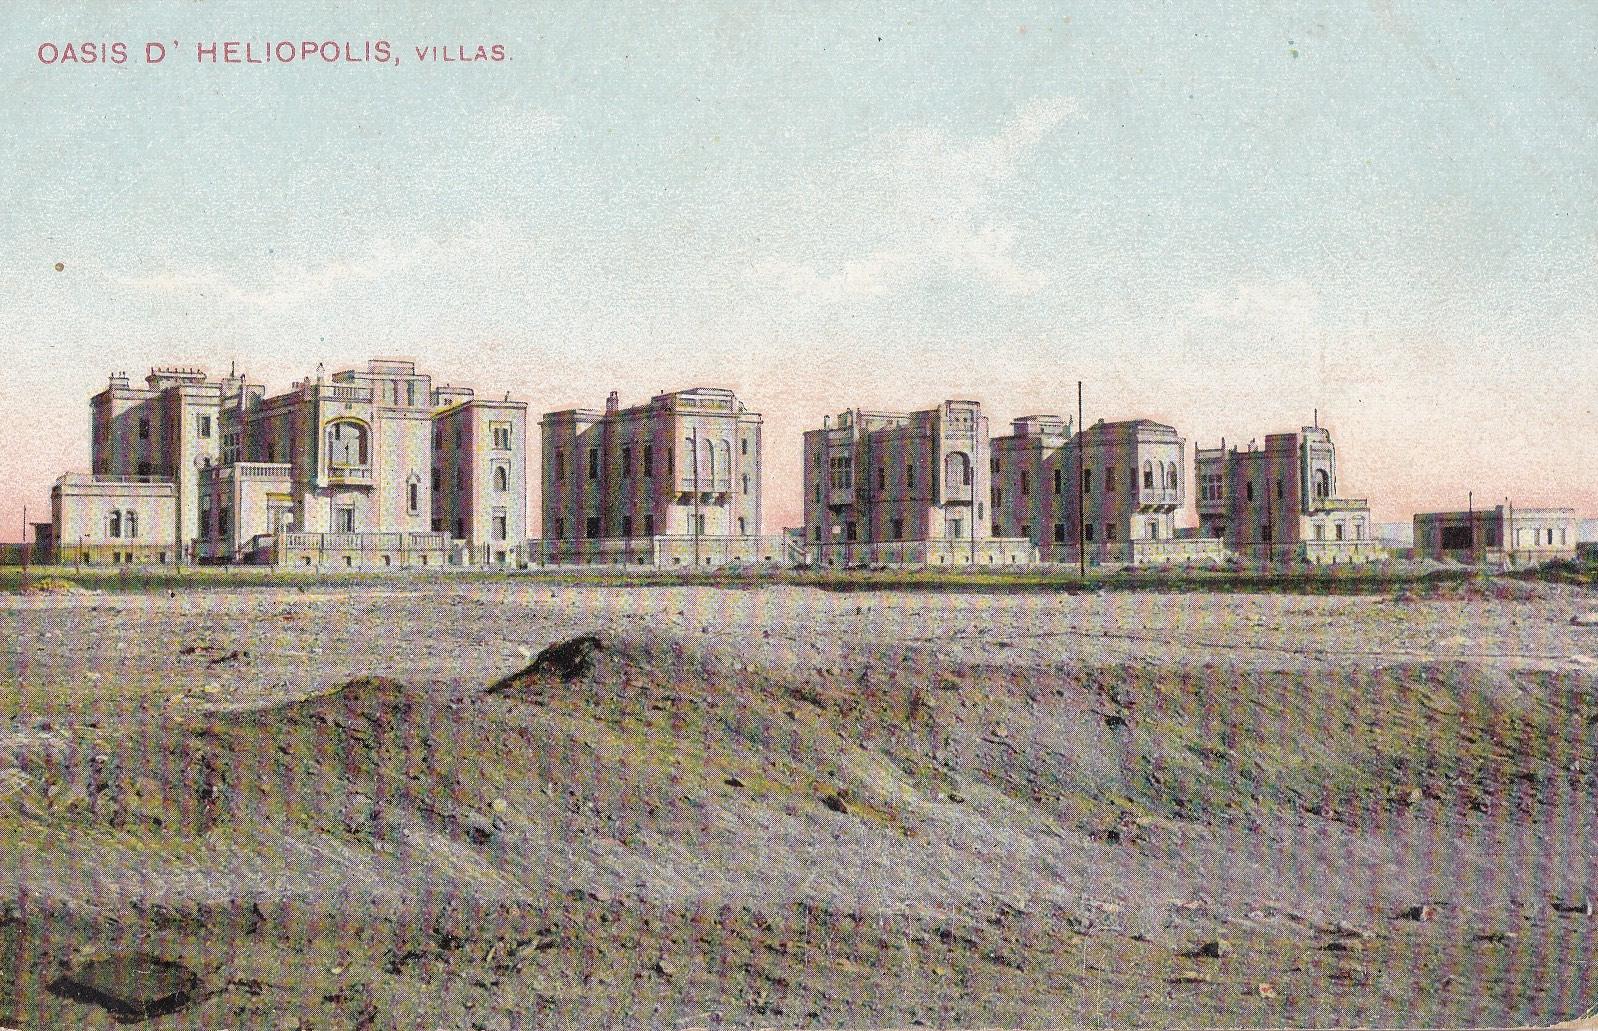 Postcards Heliopolis – Lichtenstern & Harari, Oasis d'Heliopolis